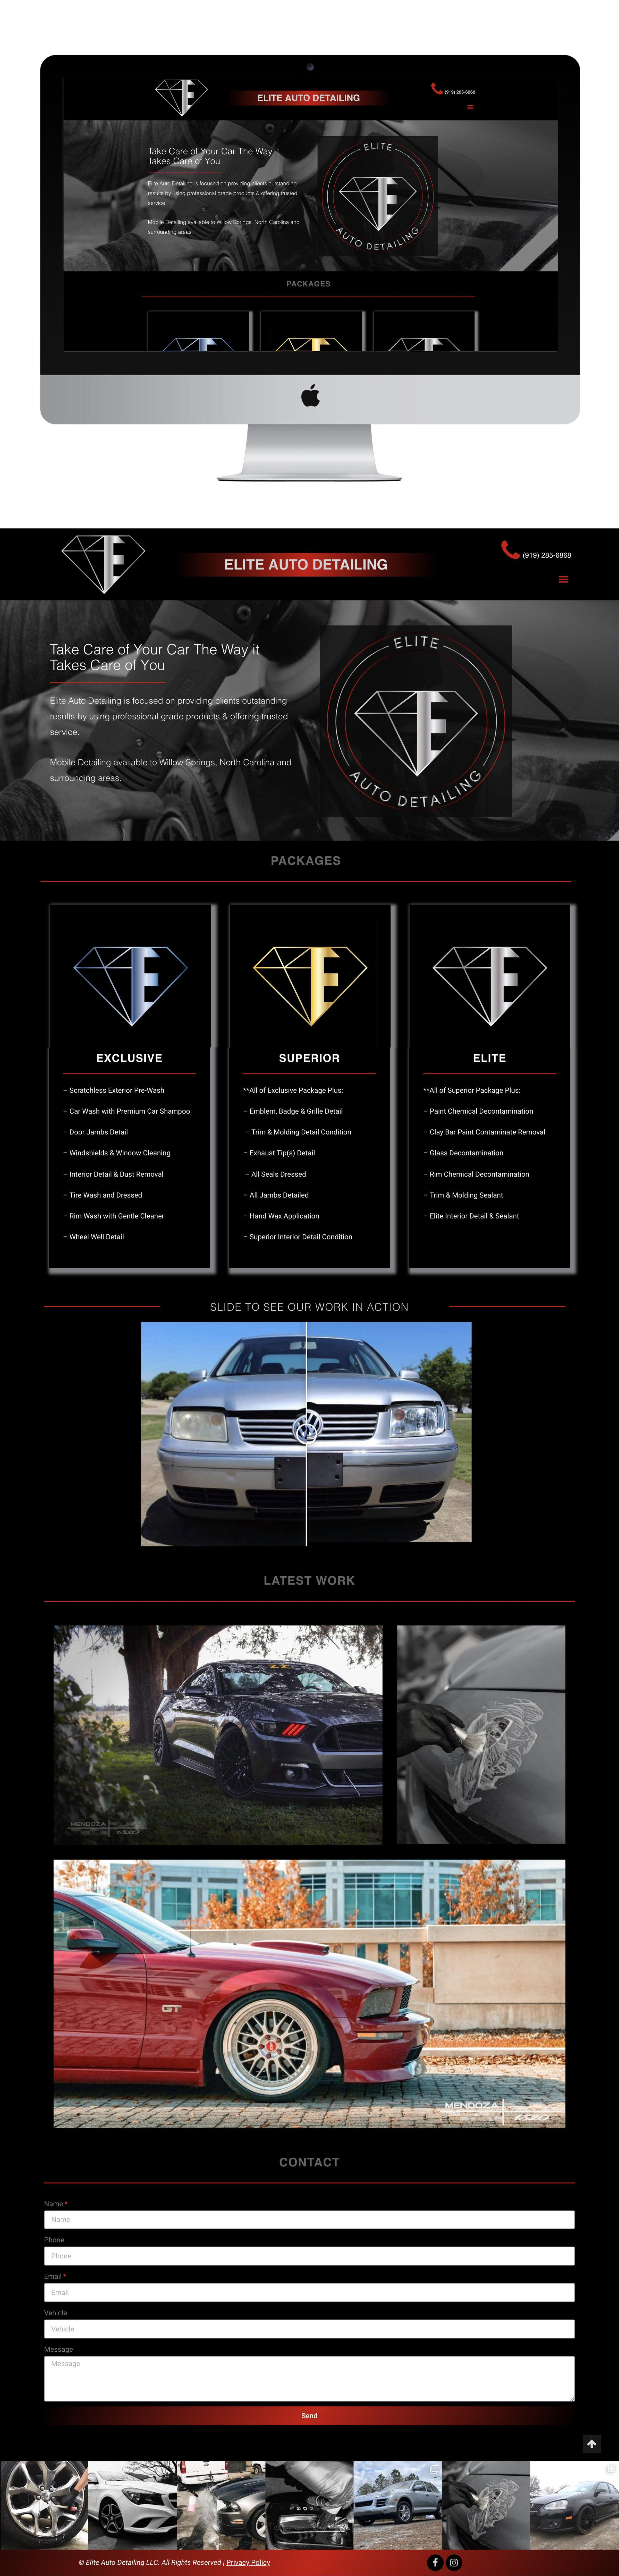 Elite Auto Detailing Web Design by Kenzi Green Design